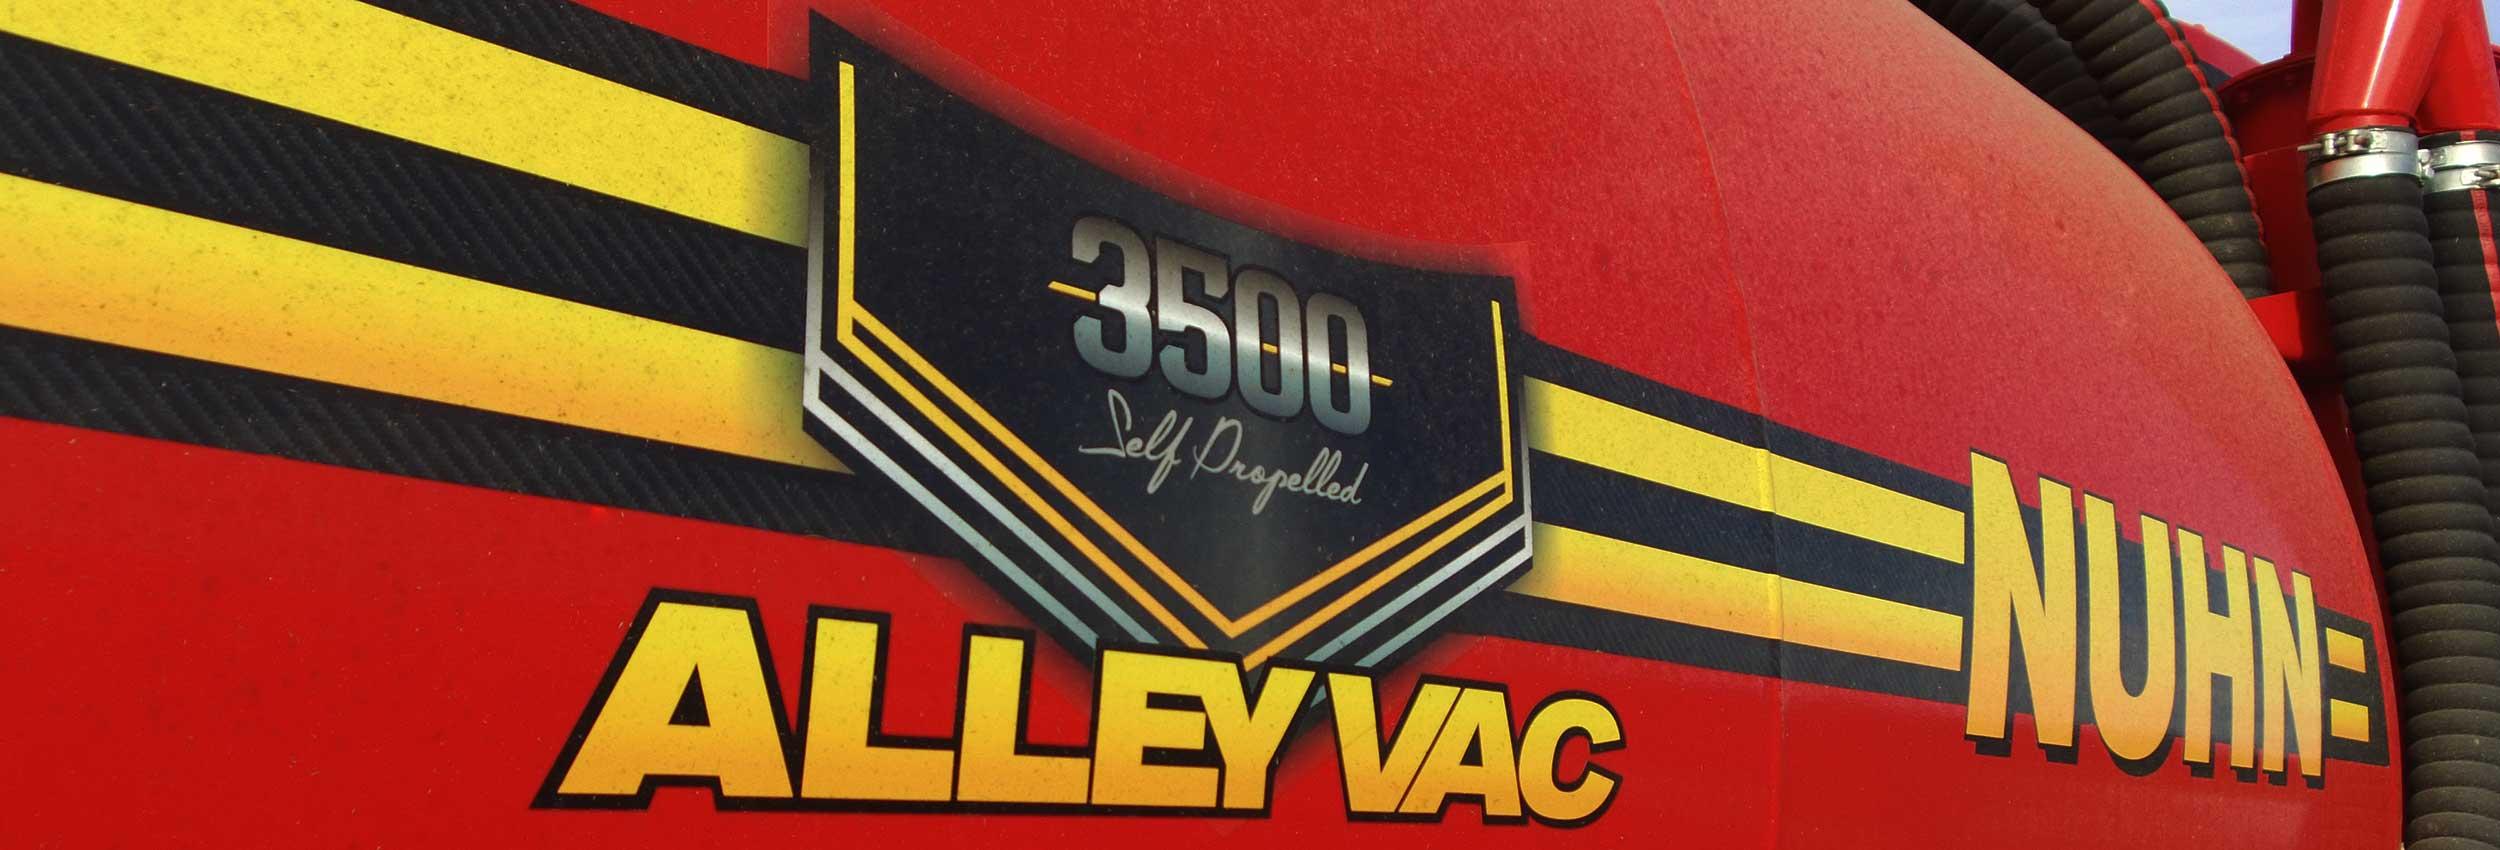 close-up-alley-vac-slider